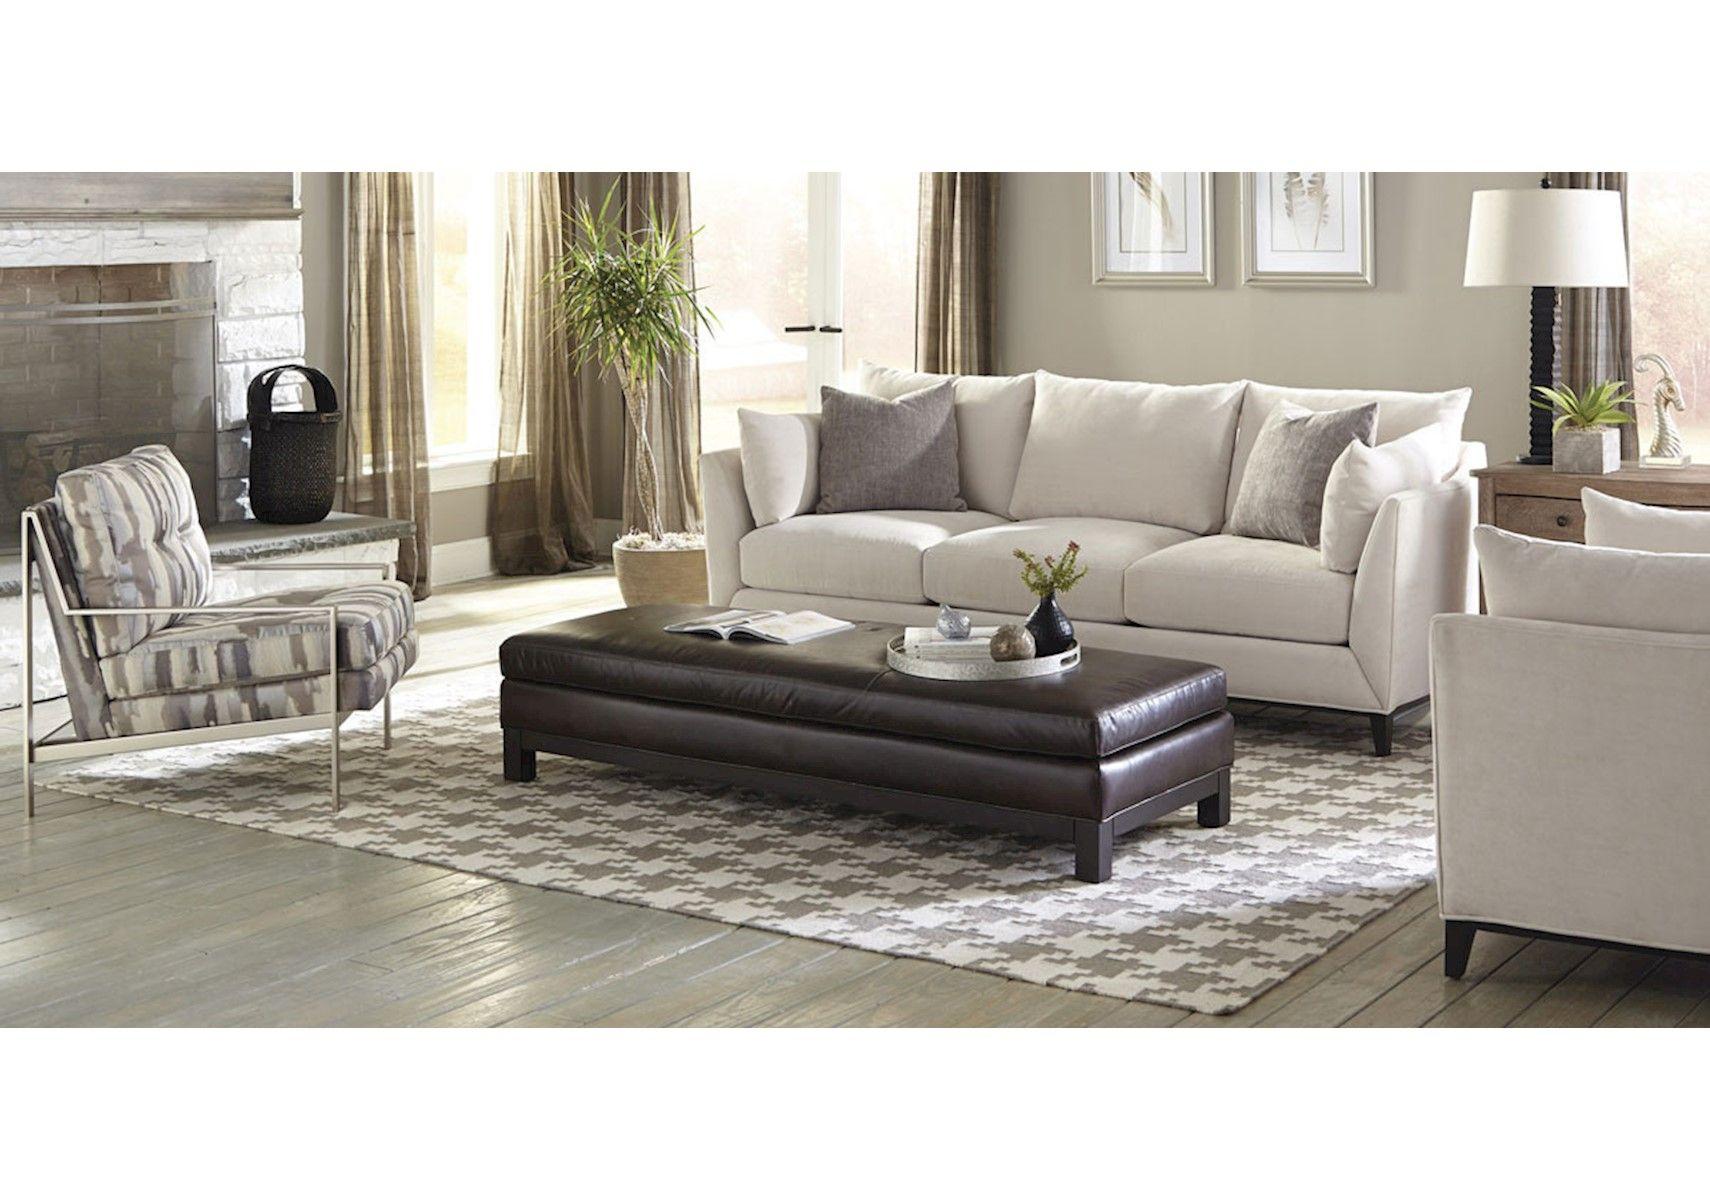 Lacks | Metro Estate 2-Pc Living Room Set | Living room ... on Patio Living Room Set id=75305